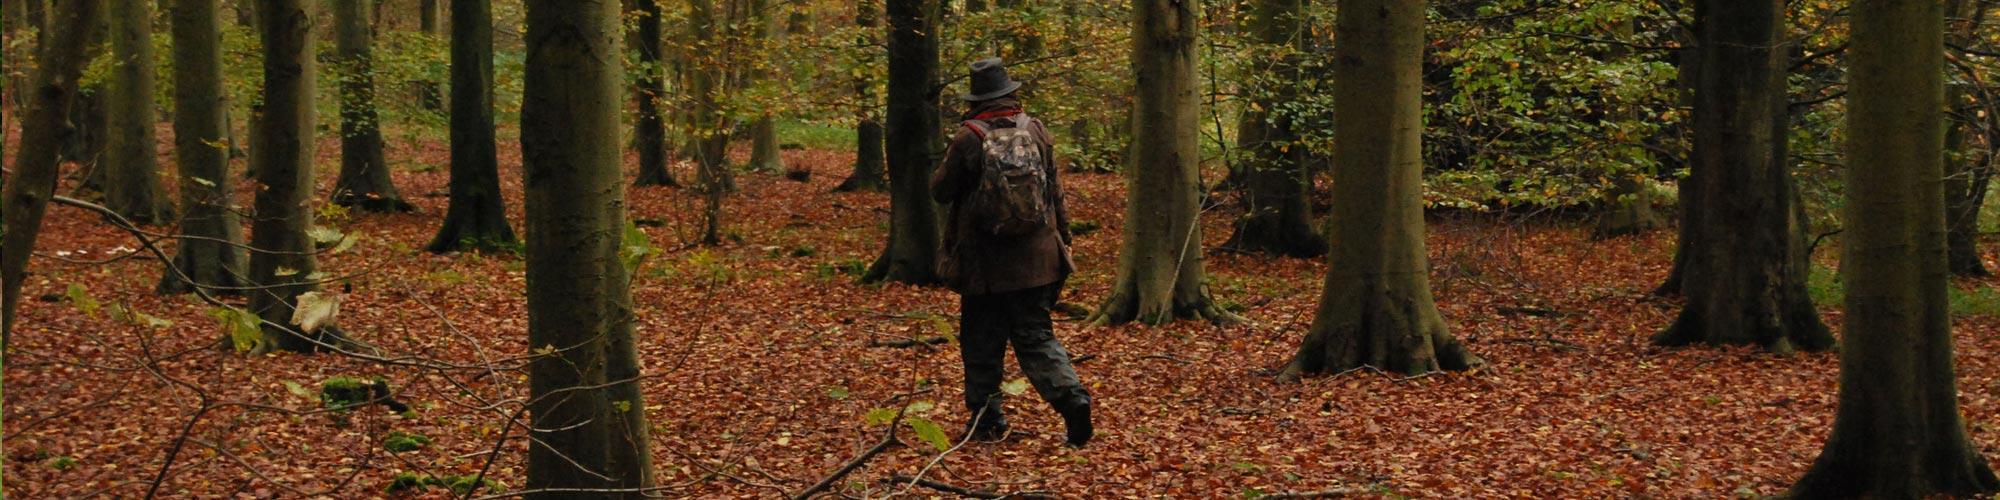 Truffle-And-Mushroom-Hunter-Surveys